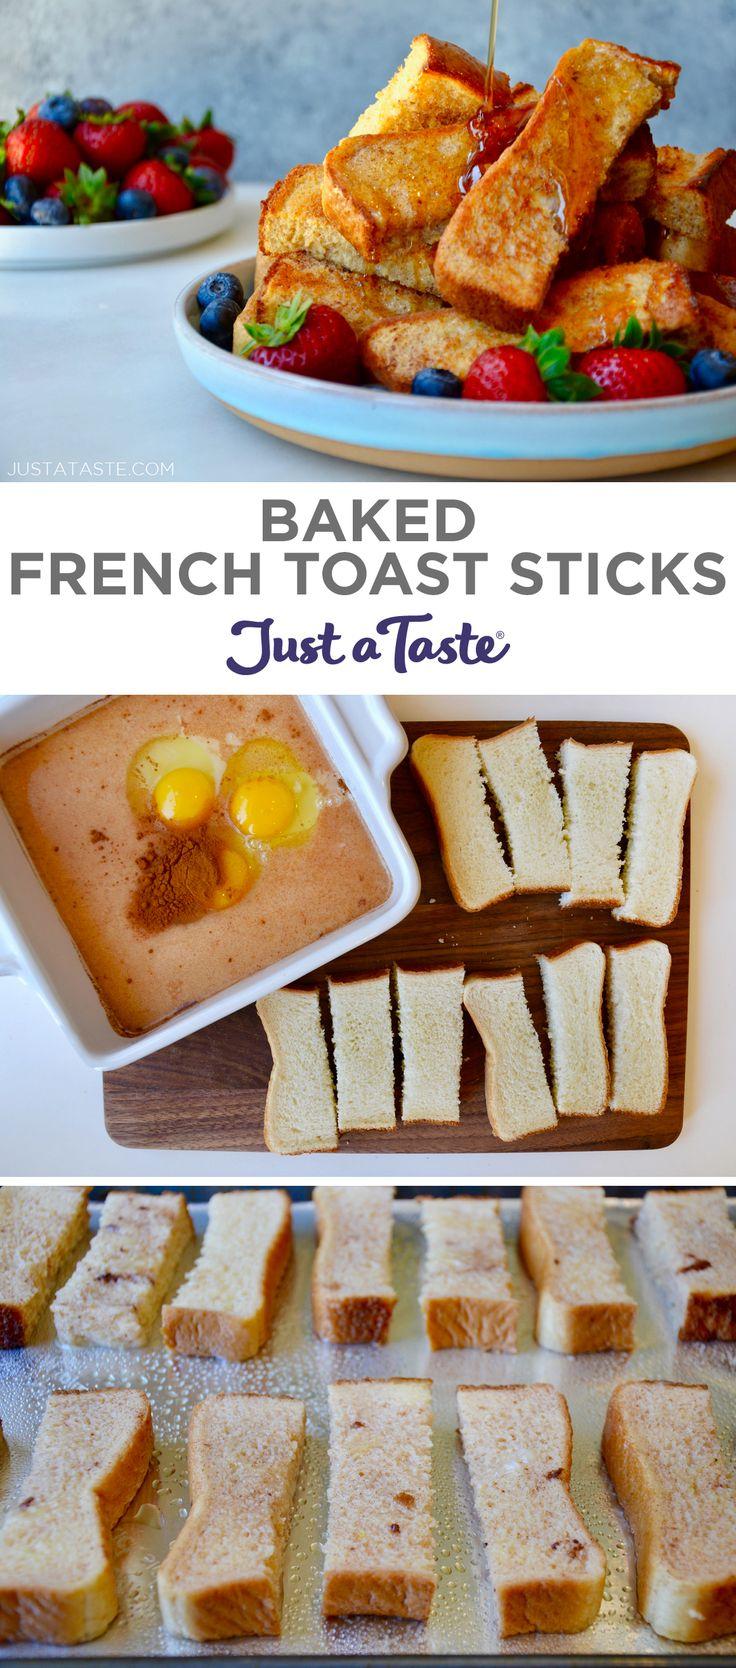 Baked French Toast Sticks (Freezer-Friendly!) recipe from justataste.com #recipes #breakfast #mealprep